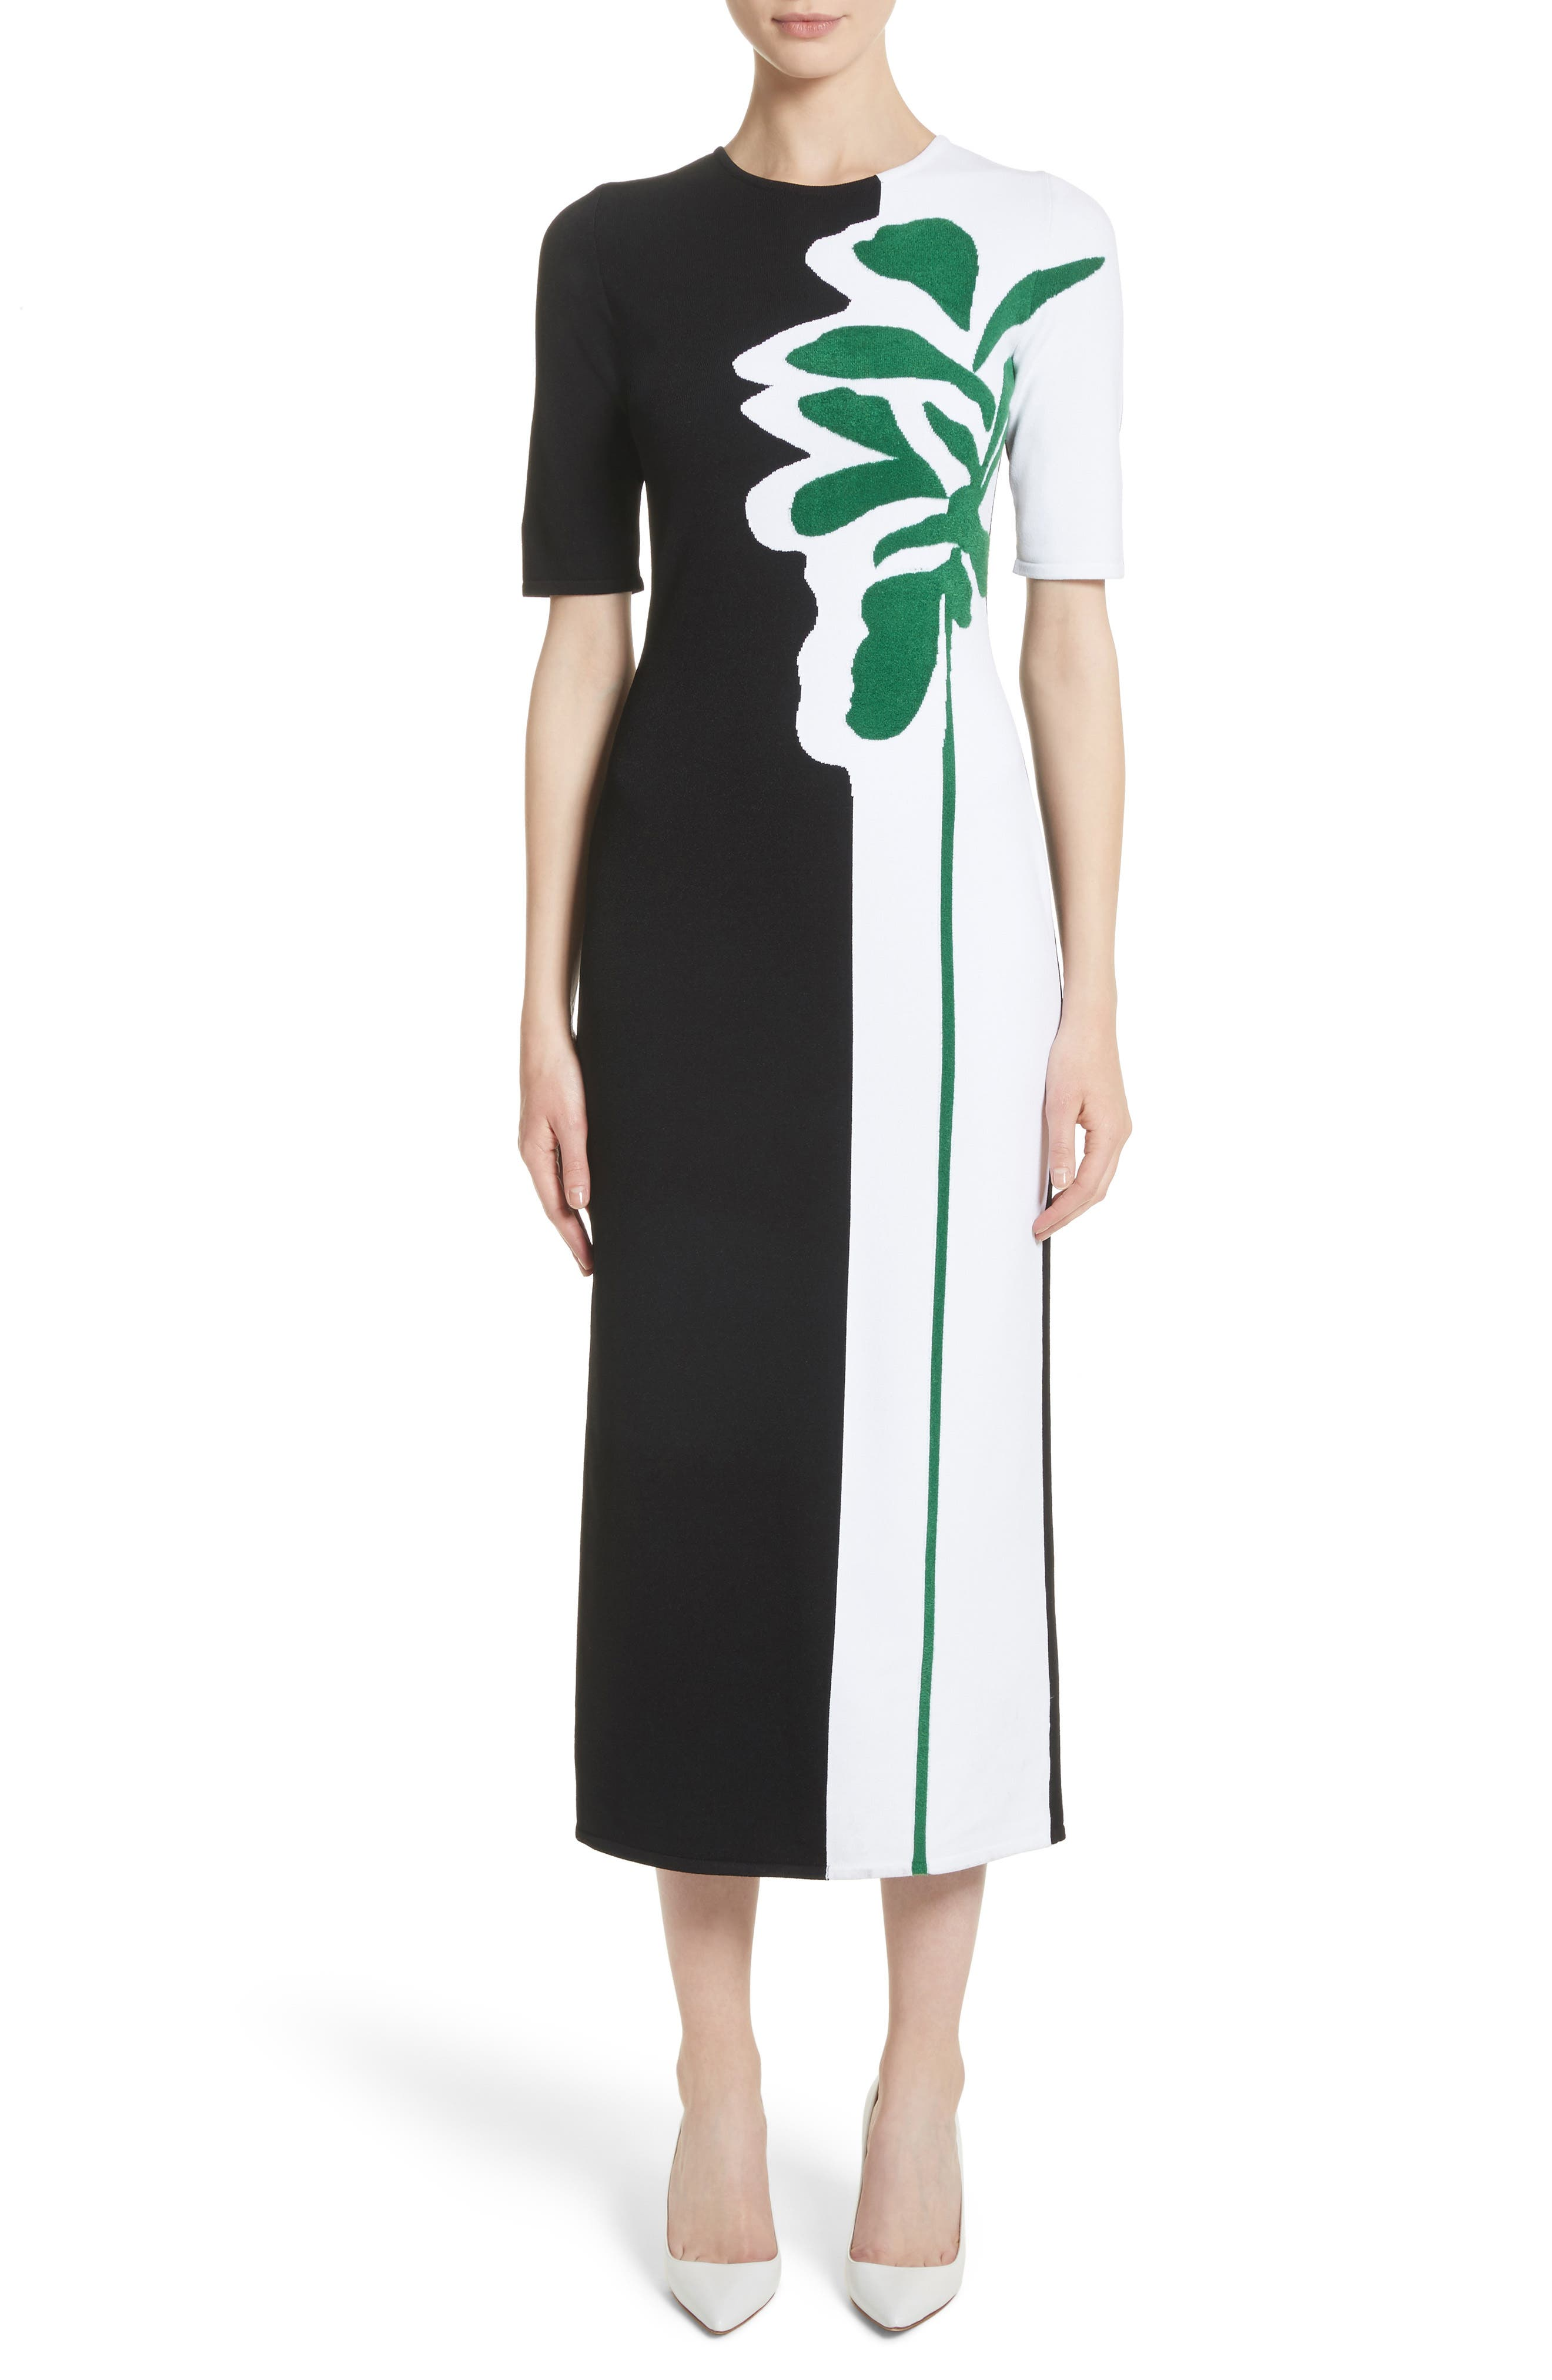 Intarsia Leaf Print Dress,                             Main thumbnail 1, color,                             White/ Black/ Evergreen